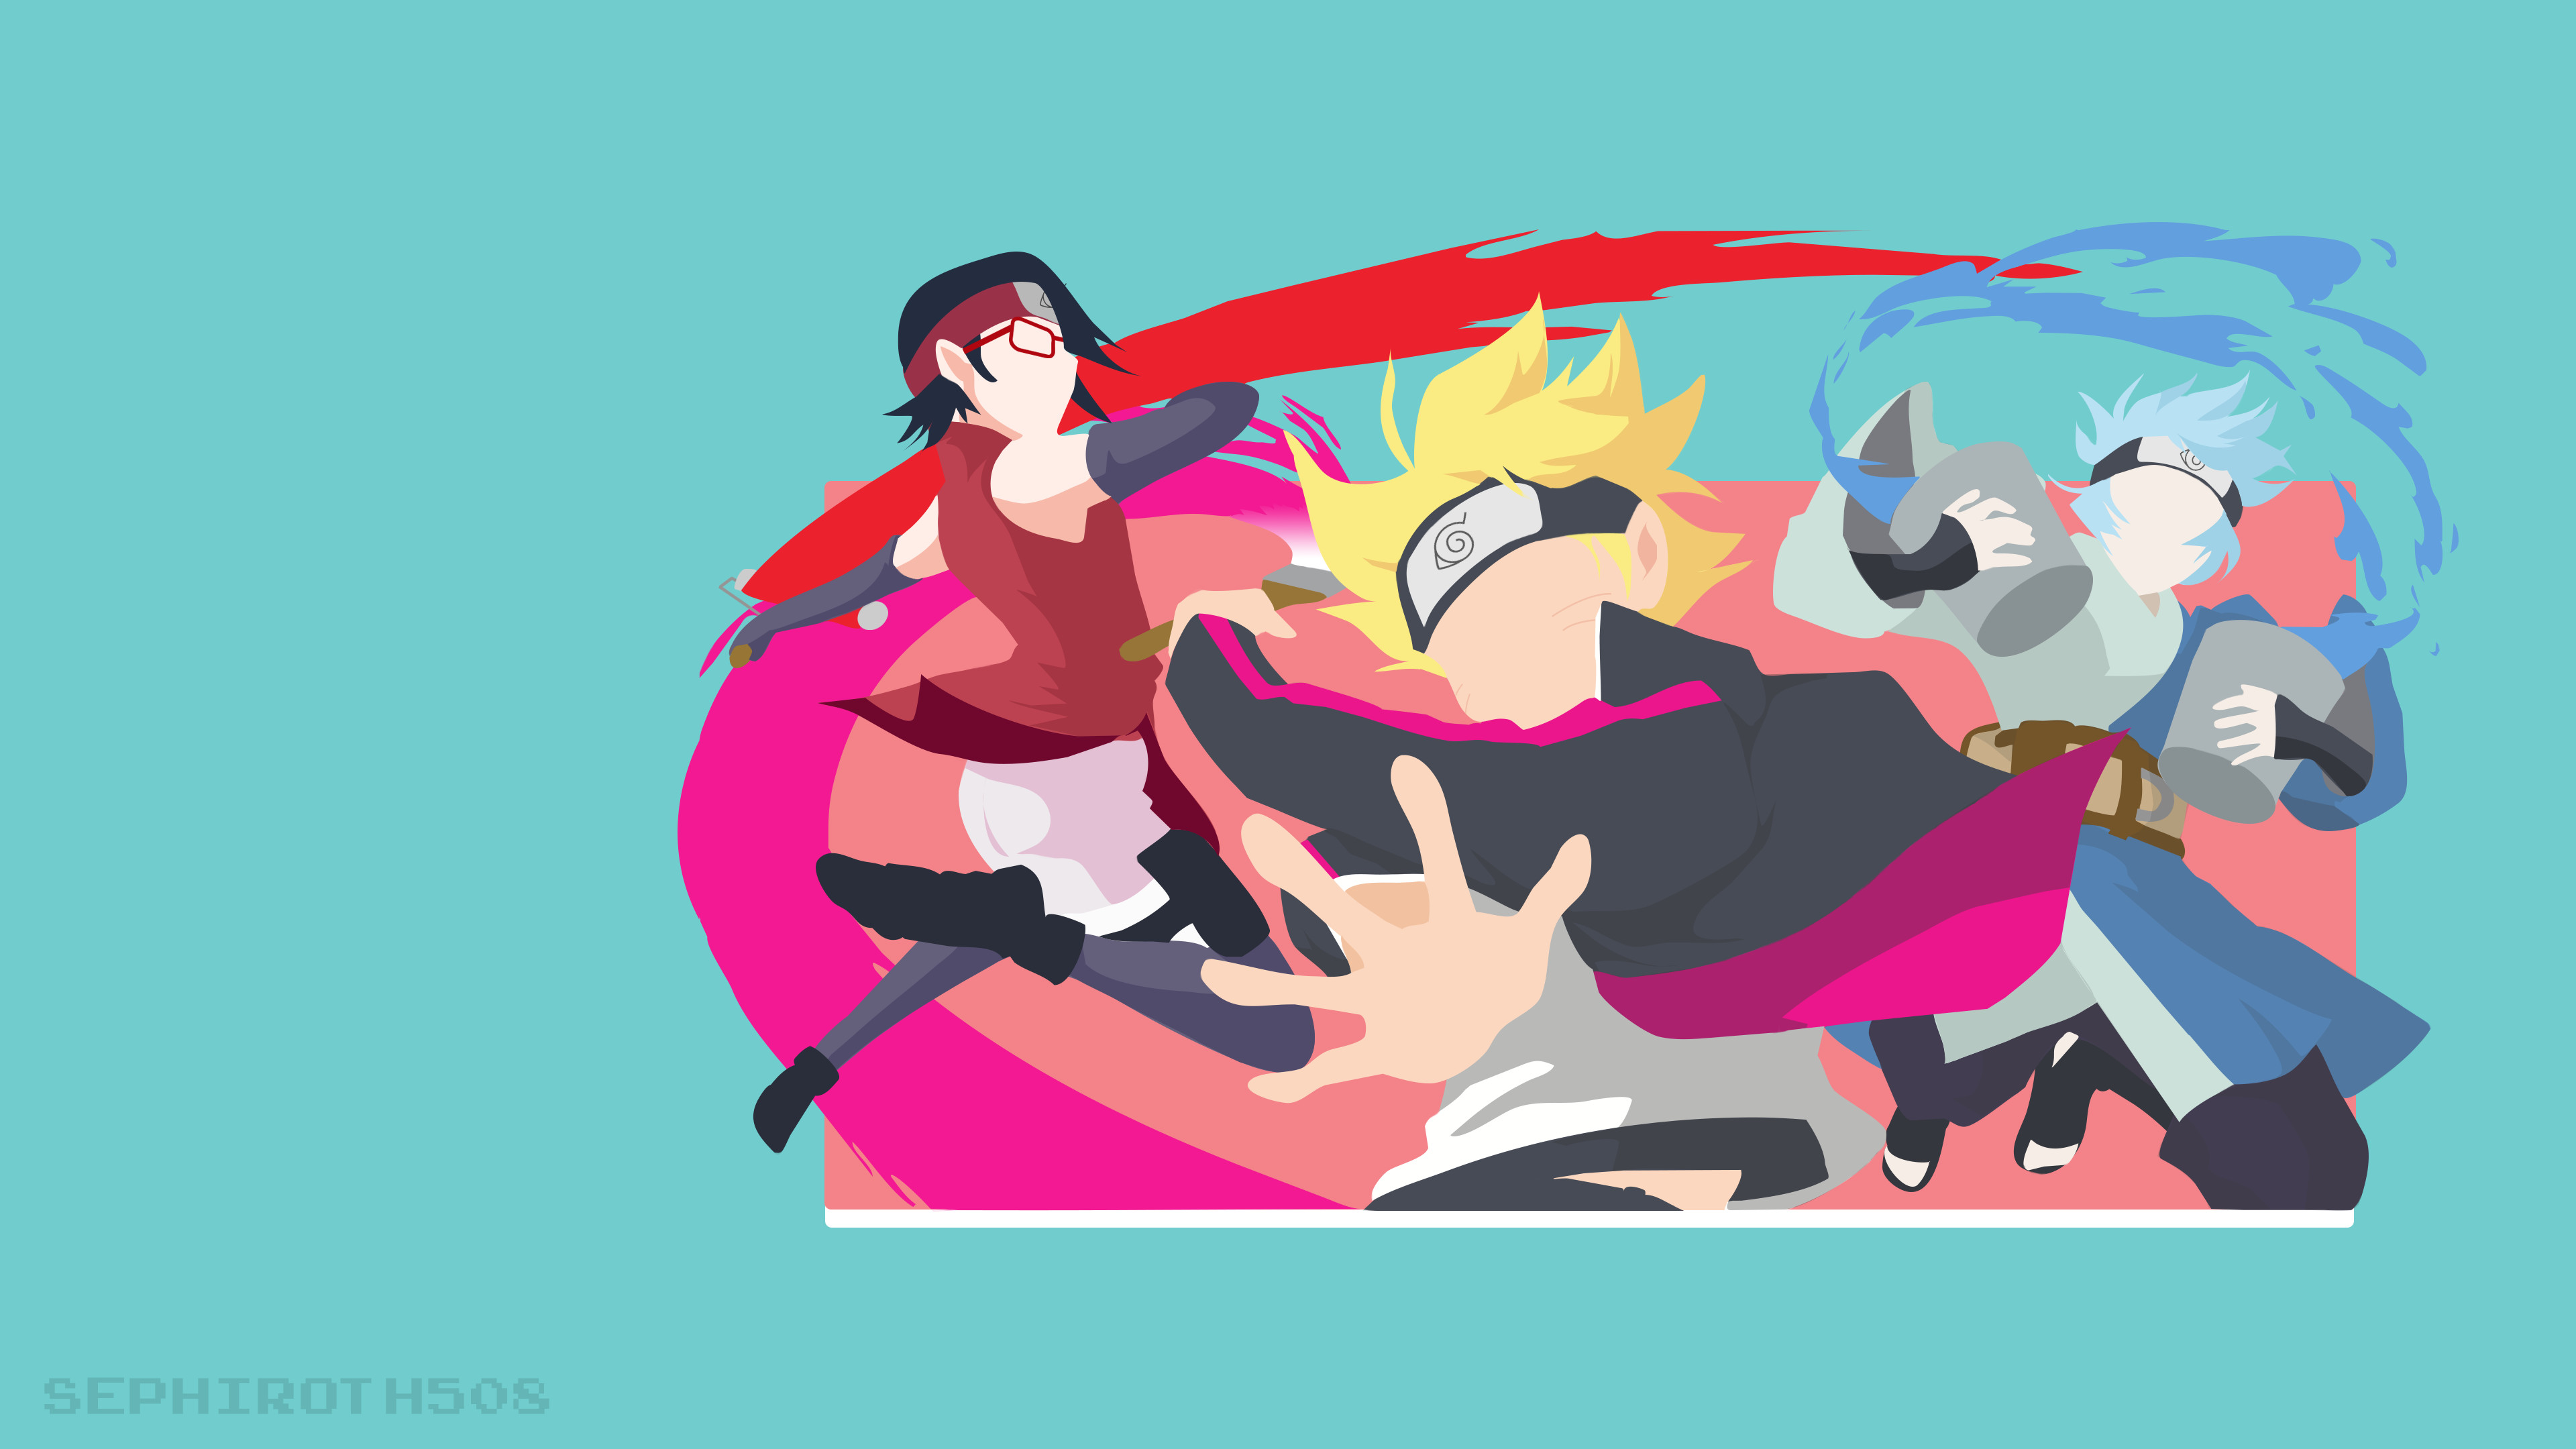 ArtBoruto: Naruto Next Generations | Minimalist Wallpaper …